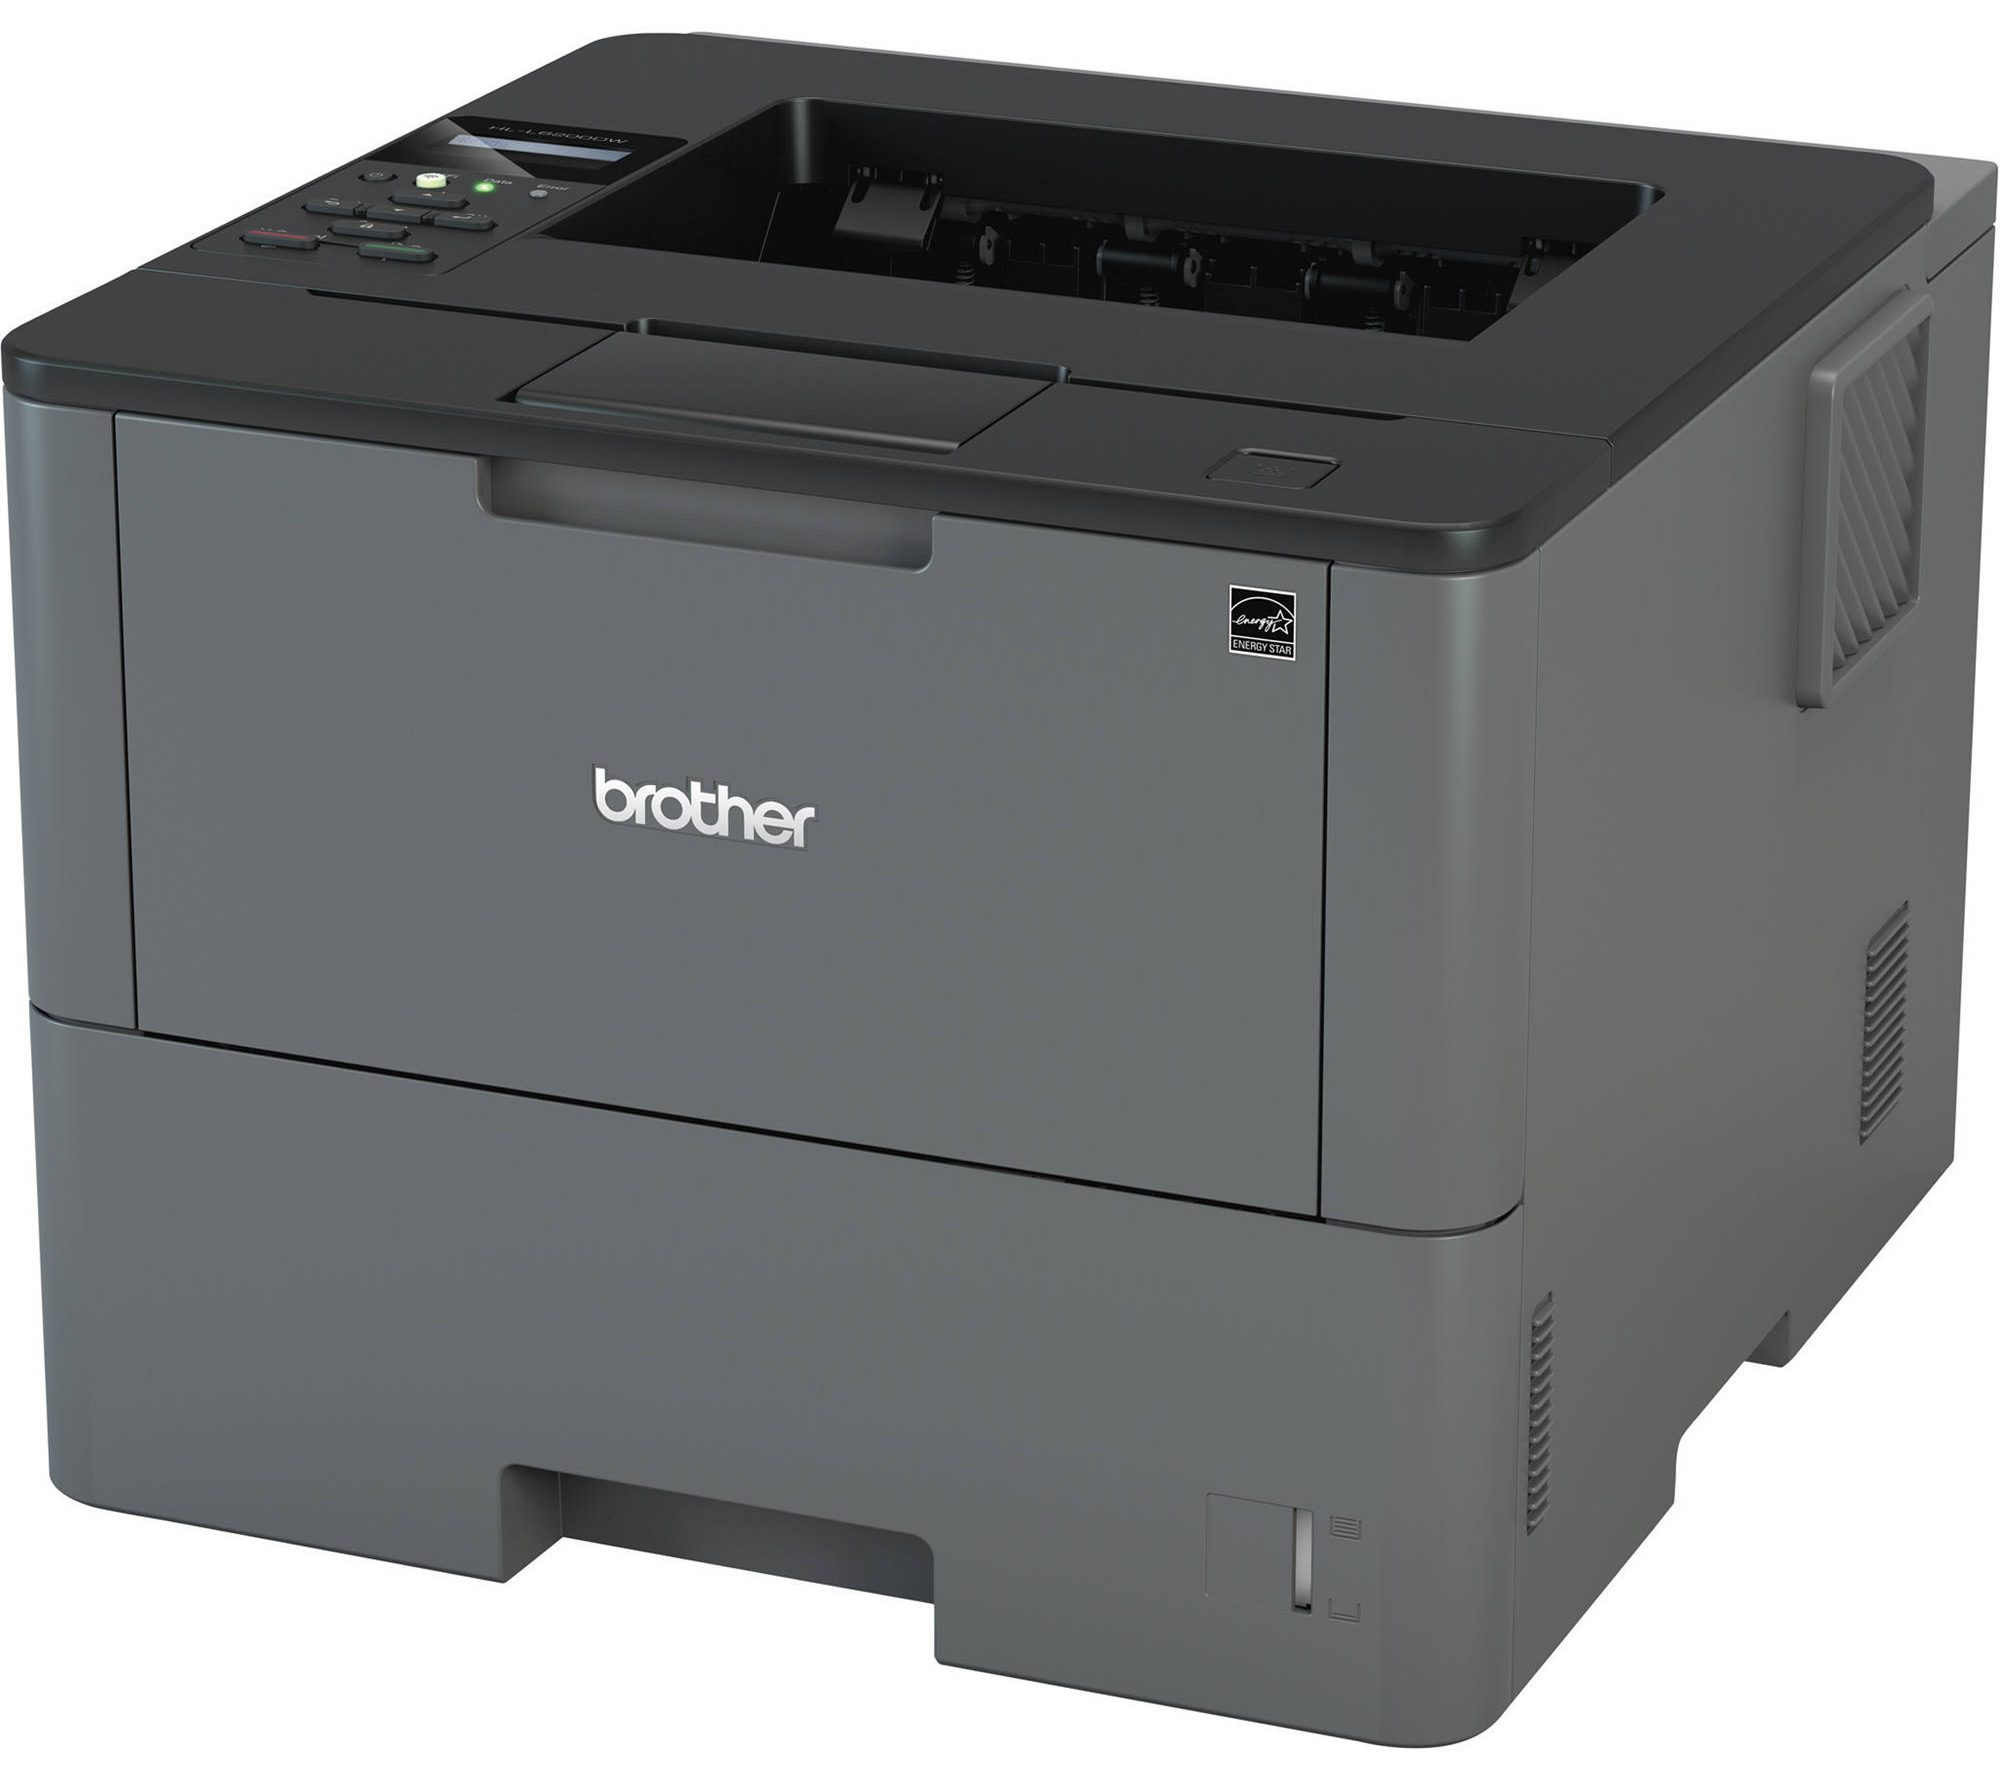 Máy in laser trắng đen BROTHER HL-L6200DW-4